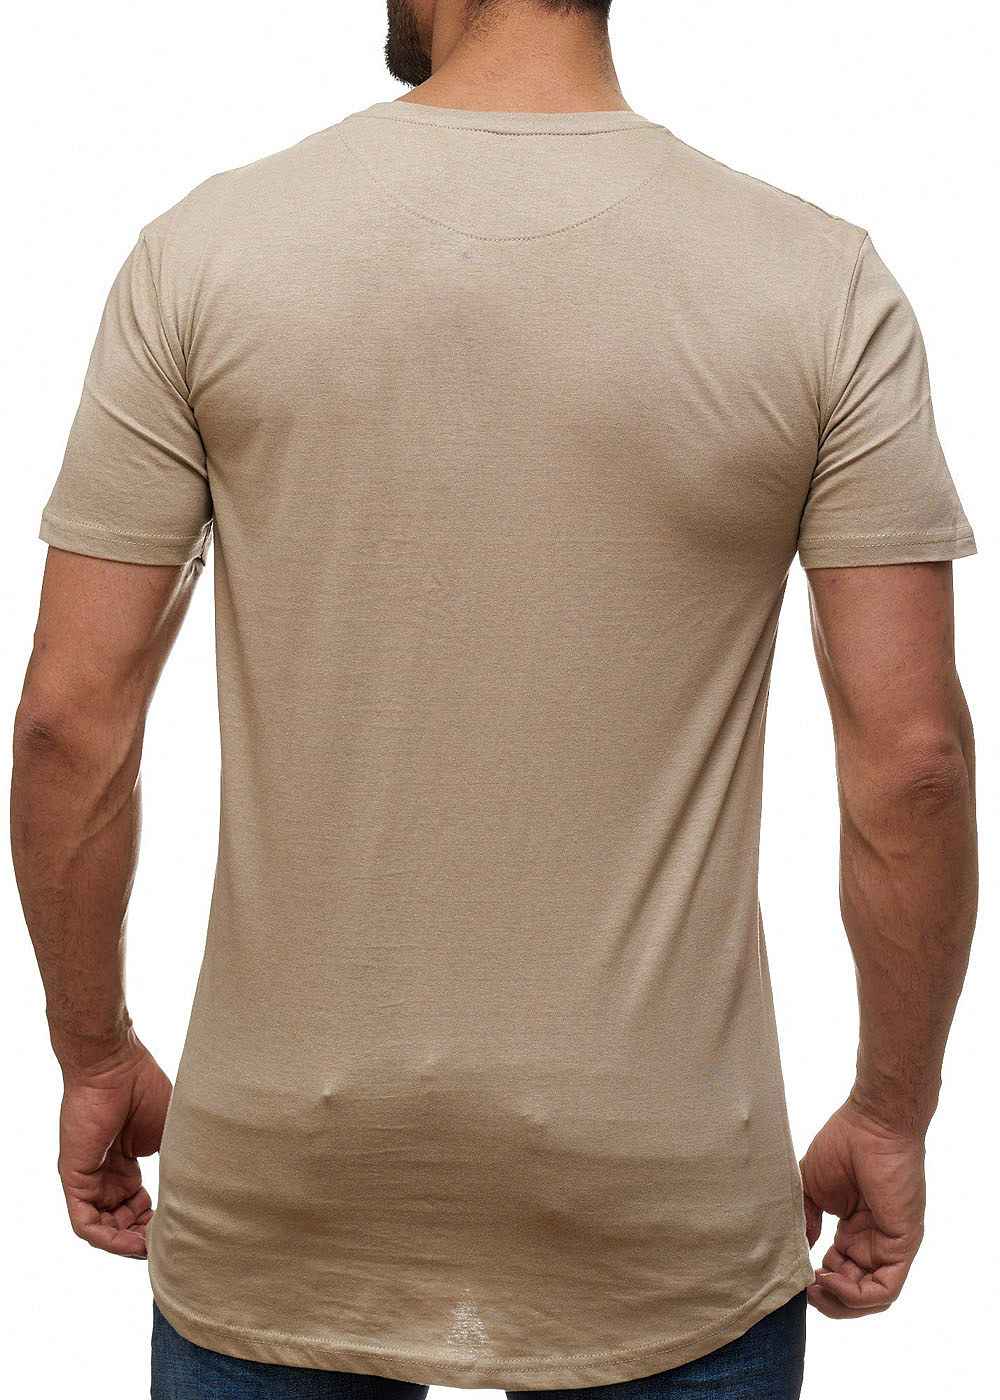 9aab9789ab4155 Seventyseven Lifestyle Herren T-Shirt Longform Brusttasche mushroom ...